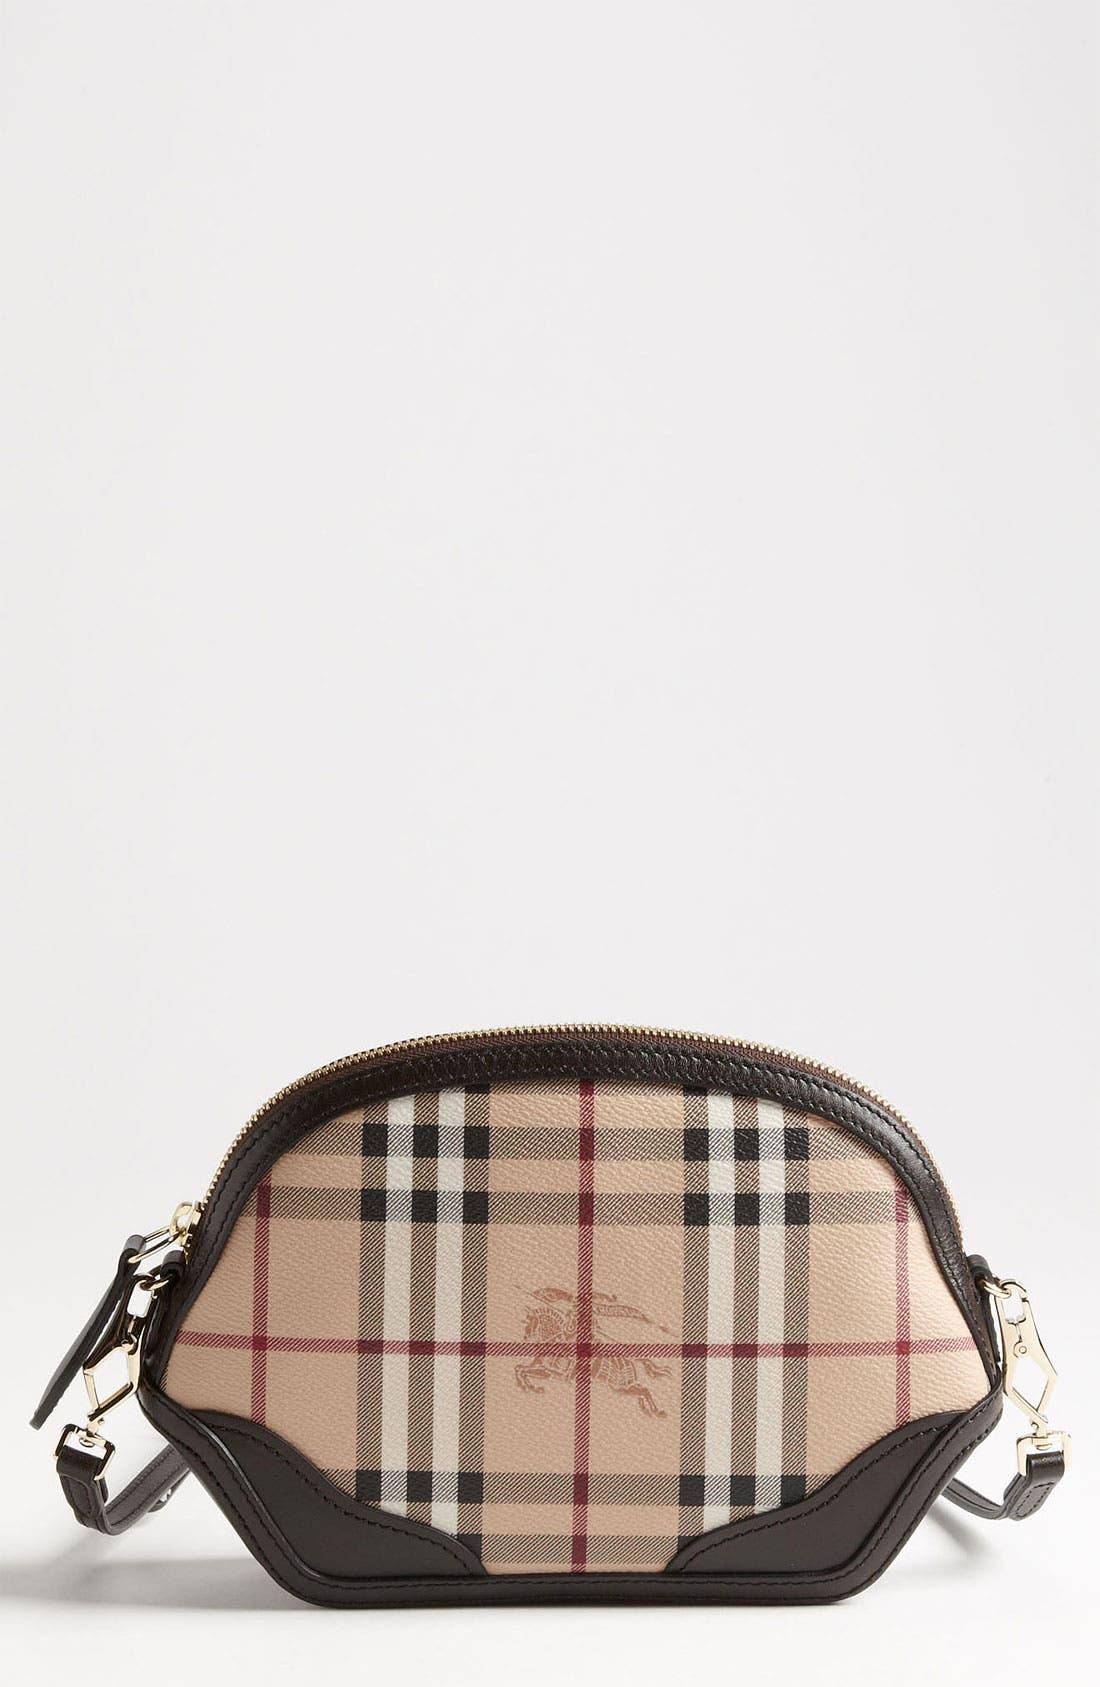 Main Image - Burberry 'Haymarket Check - Mini' Crossbody Bag